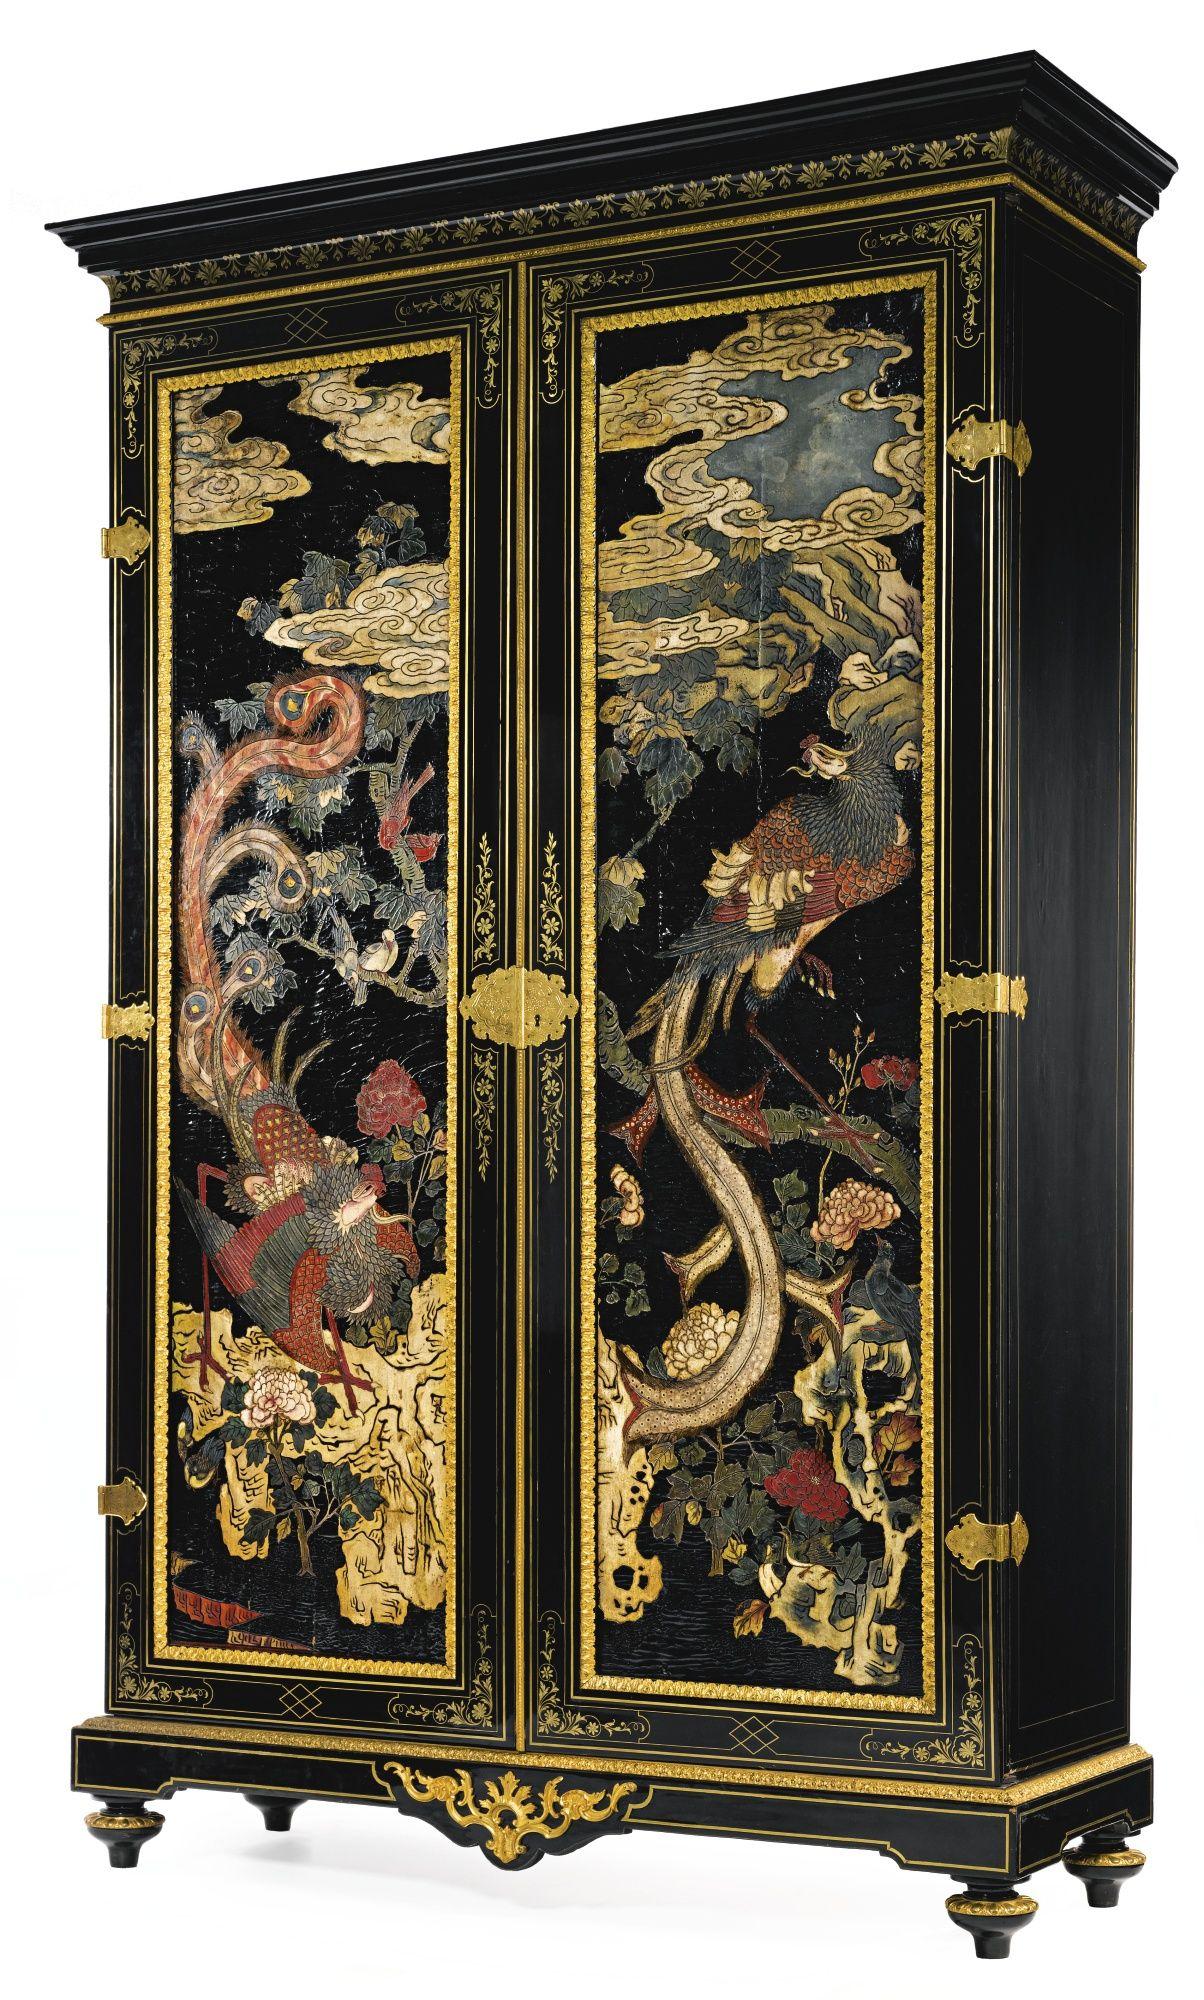 Mueble chino estilo luis xiv estilo ormolu montado y - Mueble chino antiguo ...